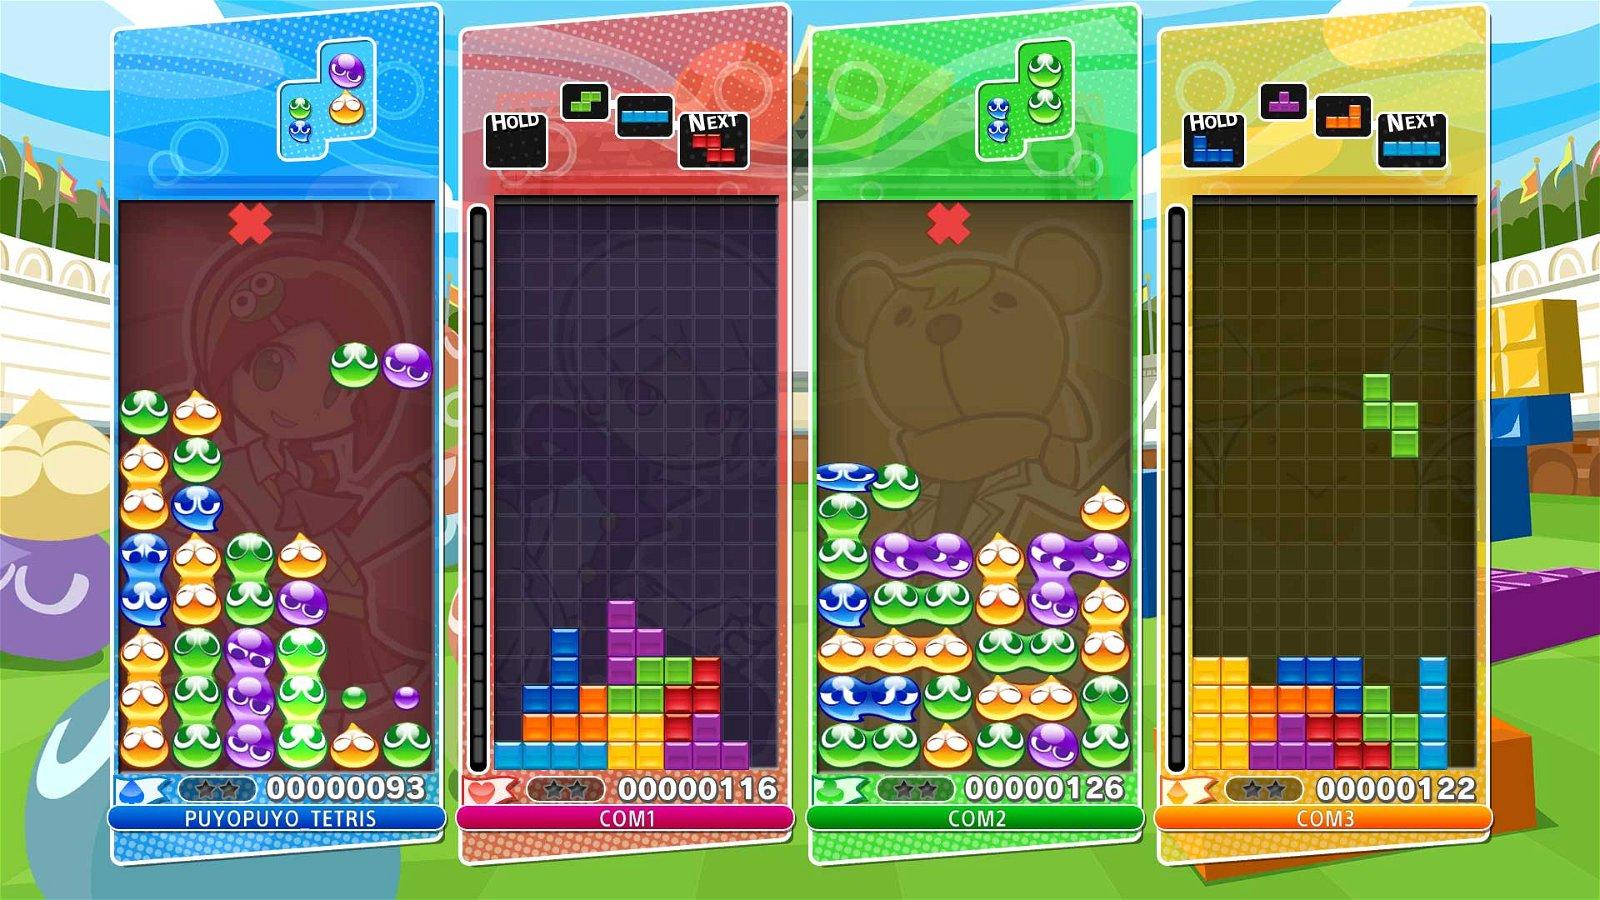 Puyo Puyo Tetris Review - Puzzle Greatness 1